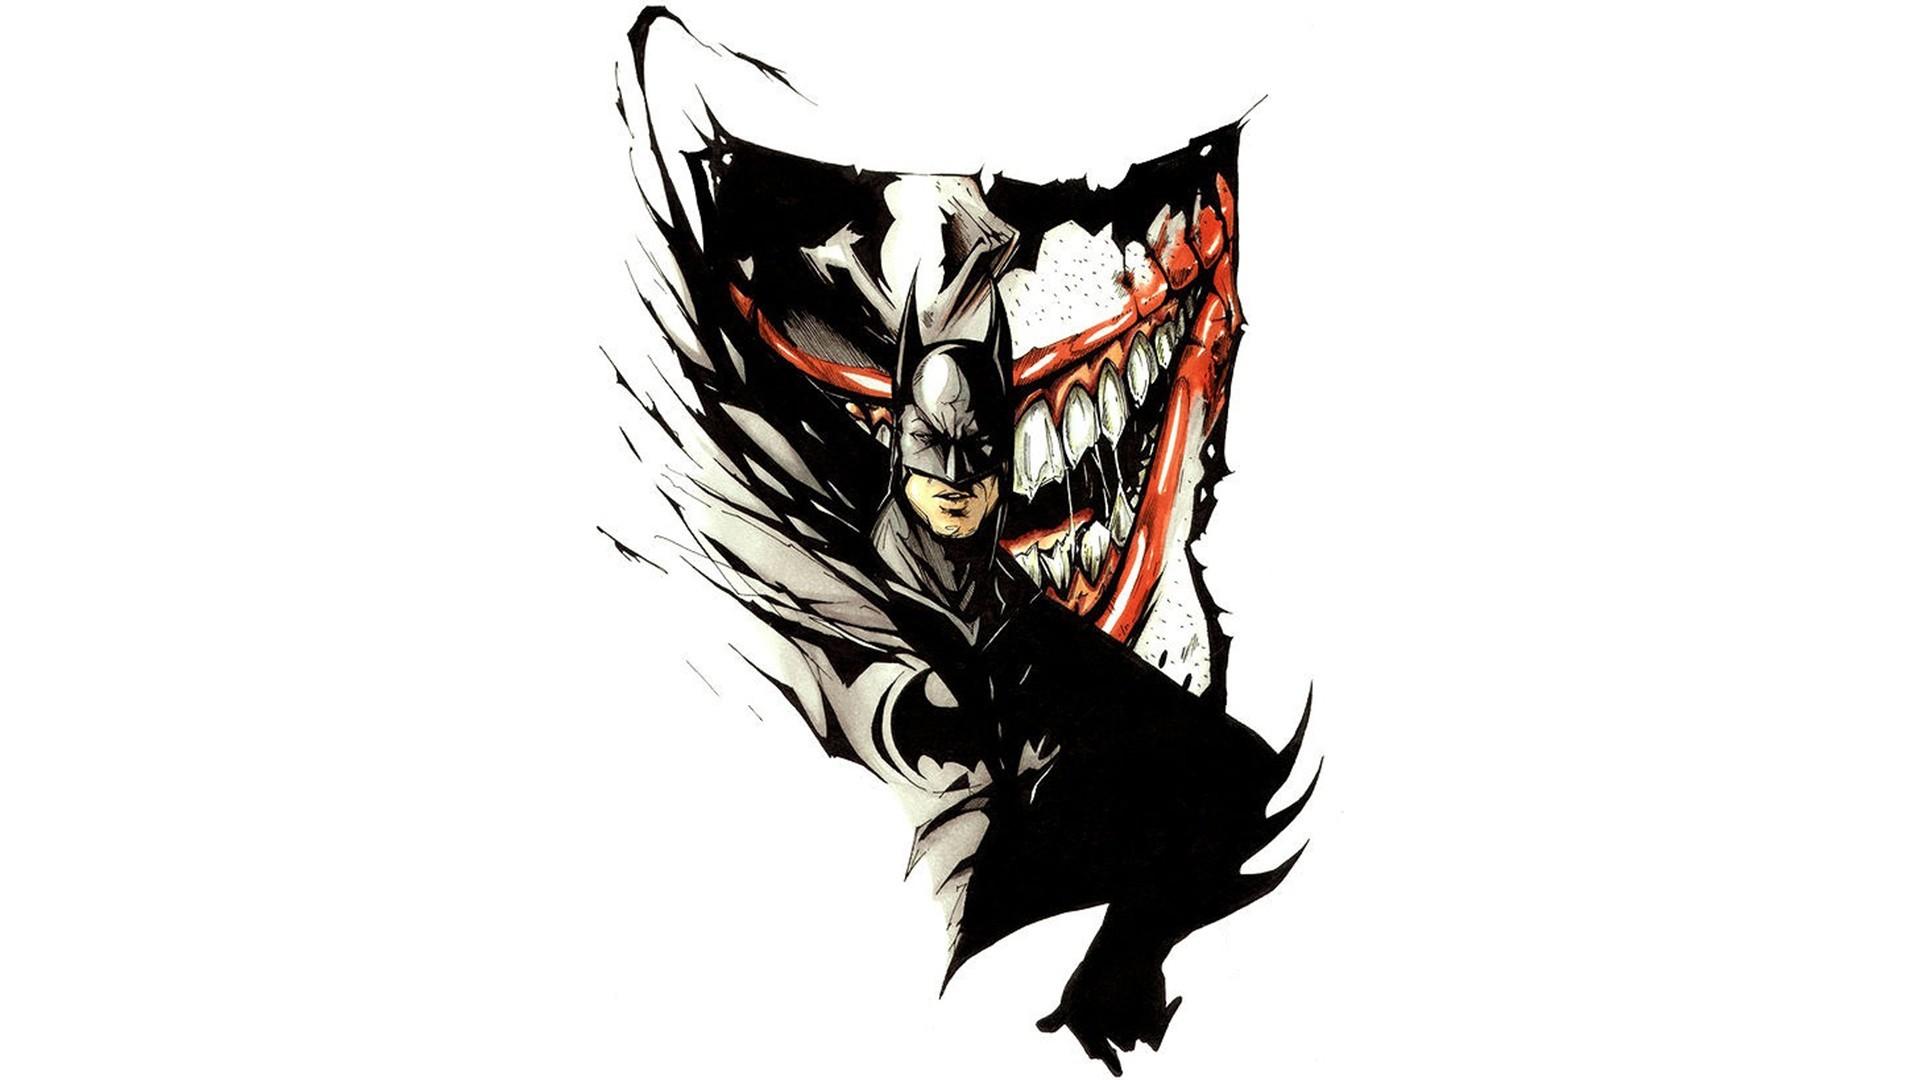 General 1920x1080 Batman Joker DC Comics artwork simple background white background